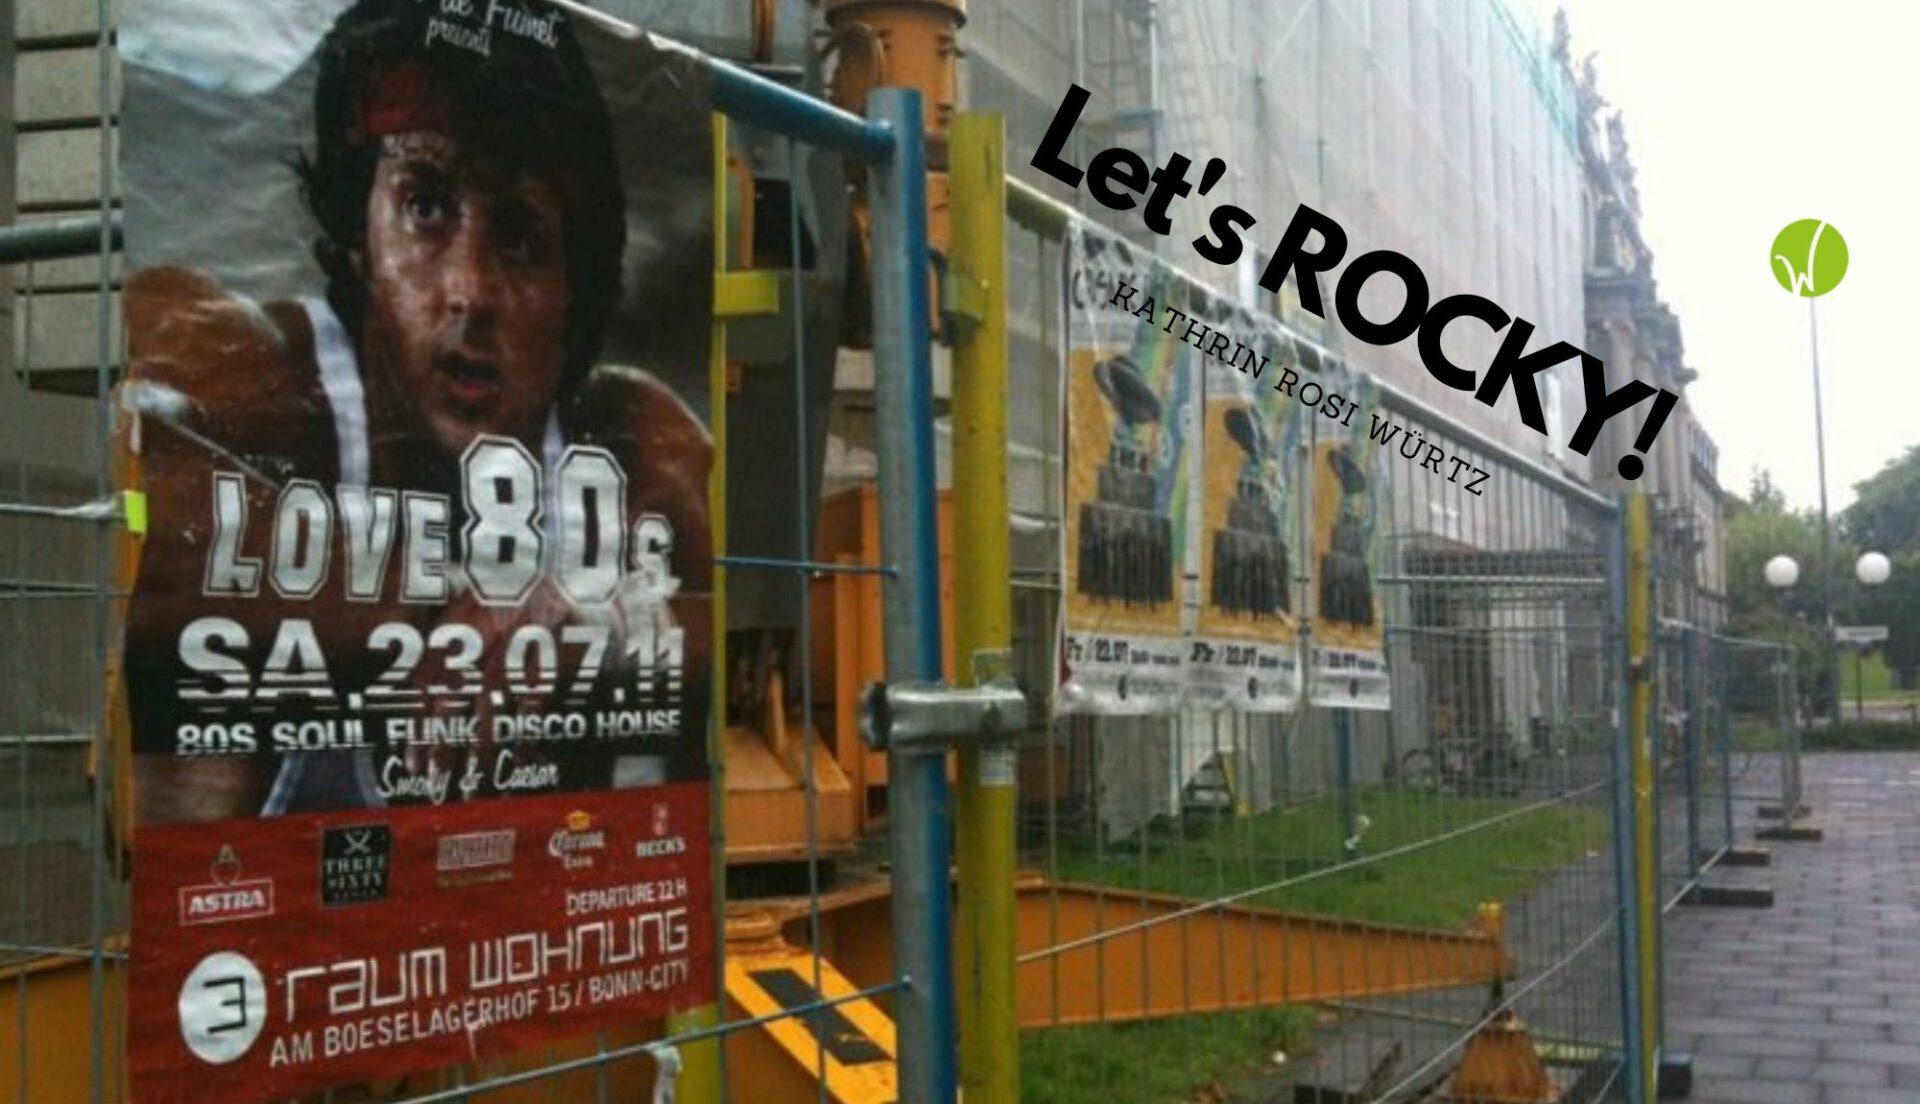 Headerbild rosiwuertz.com Rocky reloaded